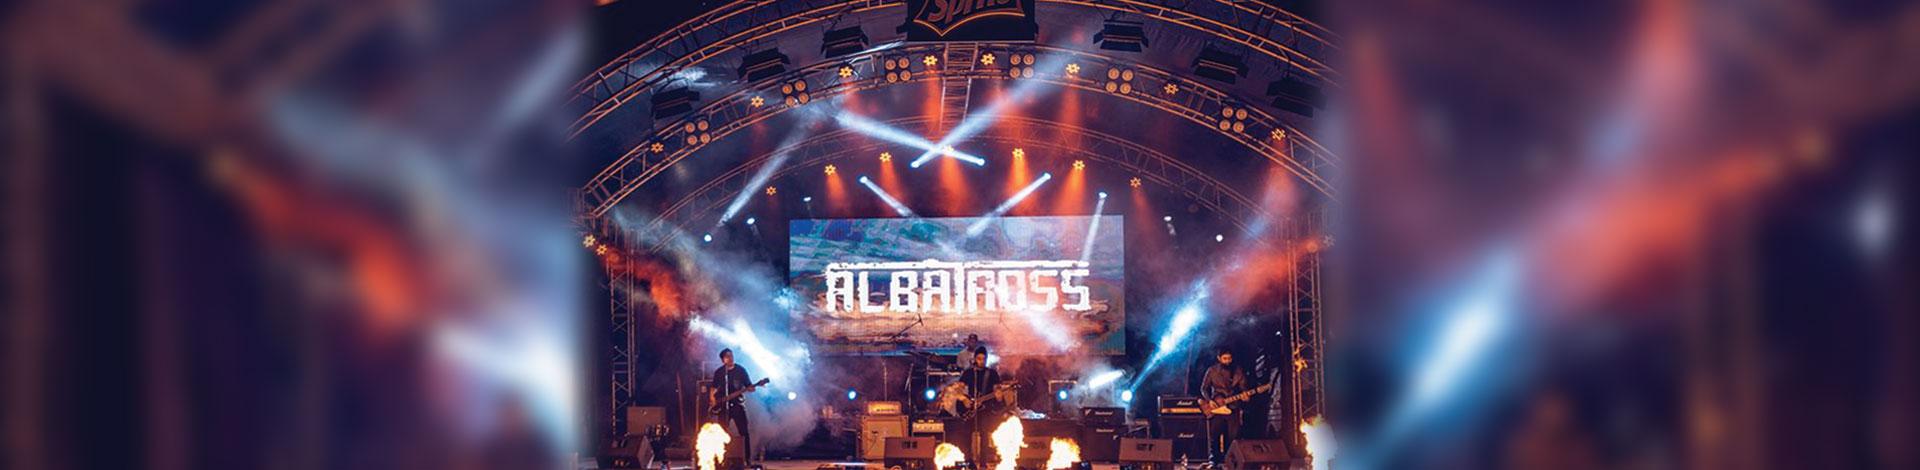 Albatorss